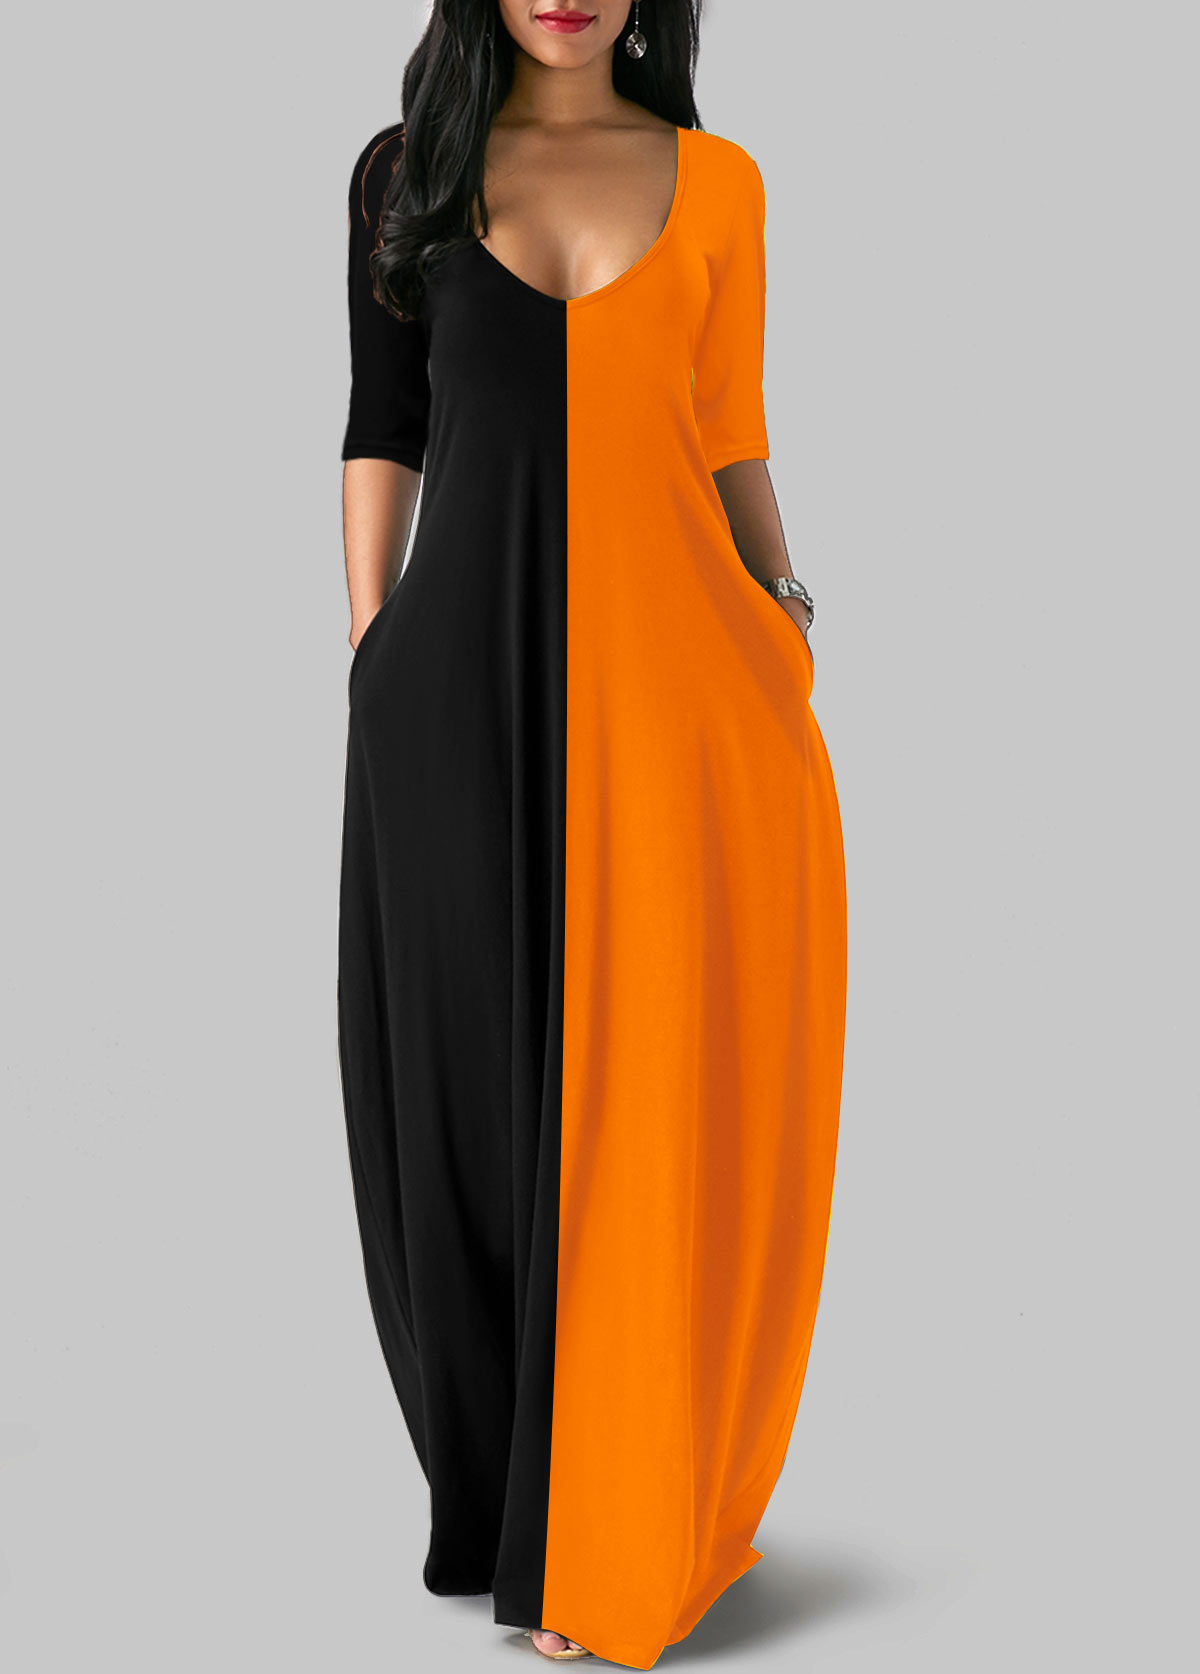 Plunging Neck Three Quarter Sleeve Color Block Maxi Dress